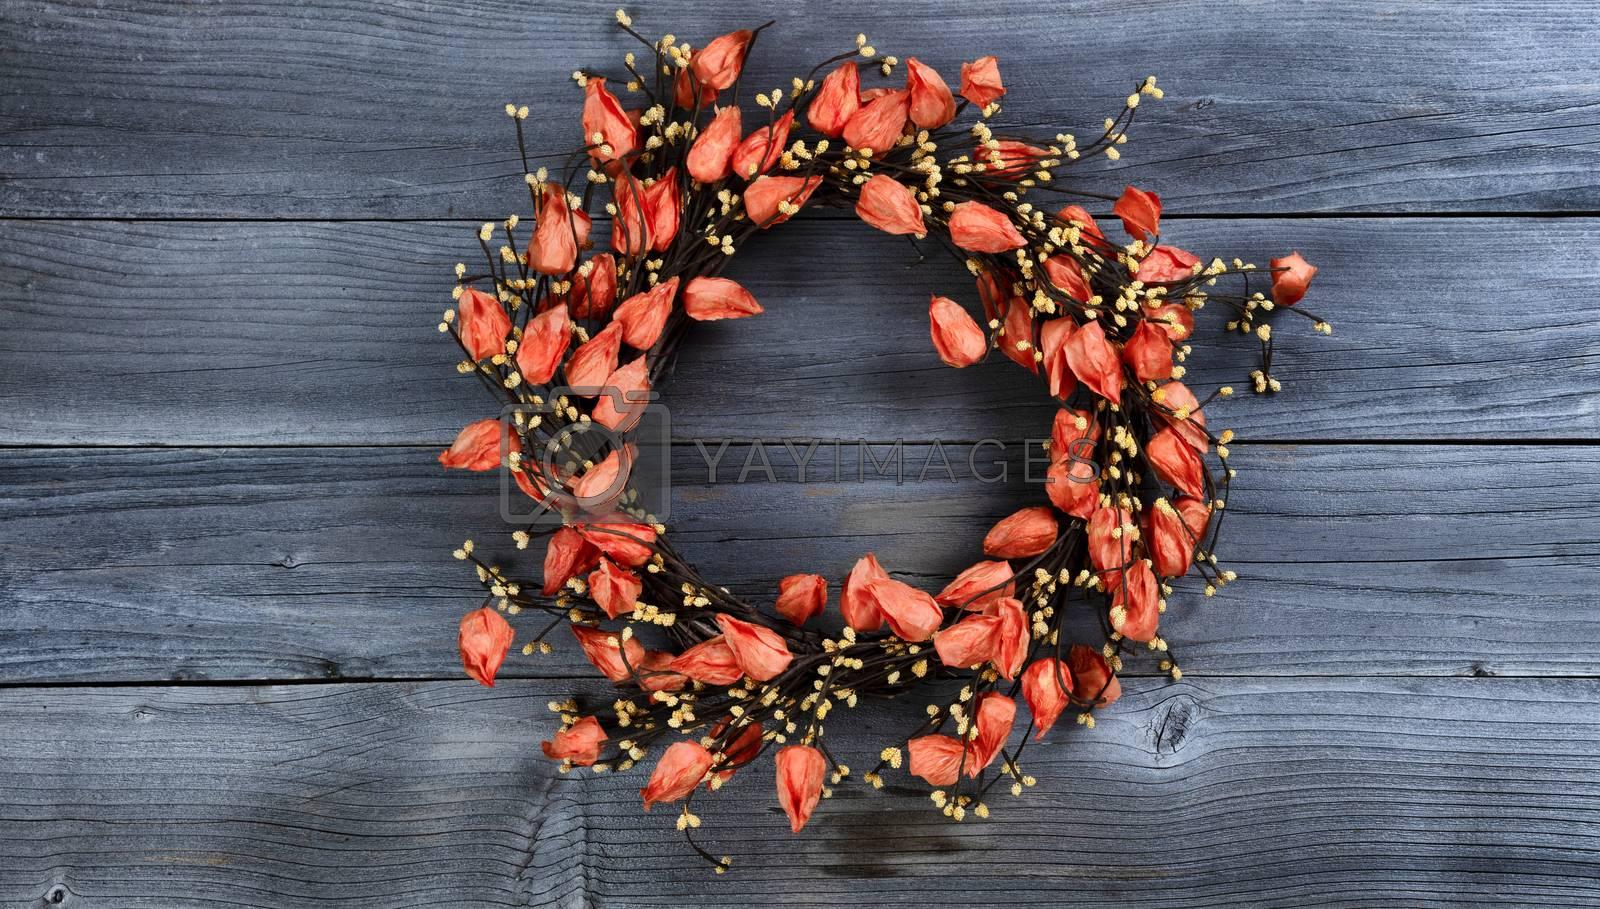 Seasonal autumn wreath with orange bell flowers on vintage wooden background